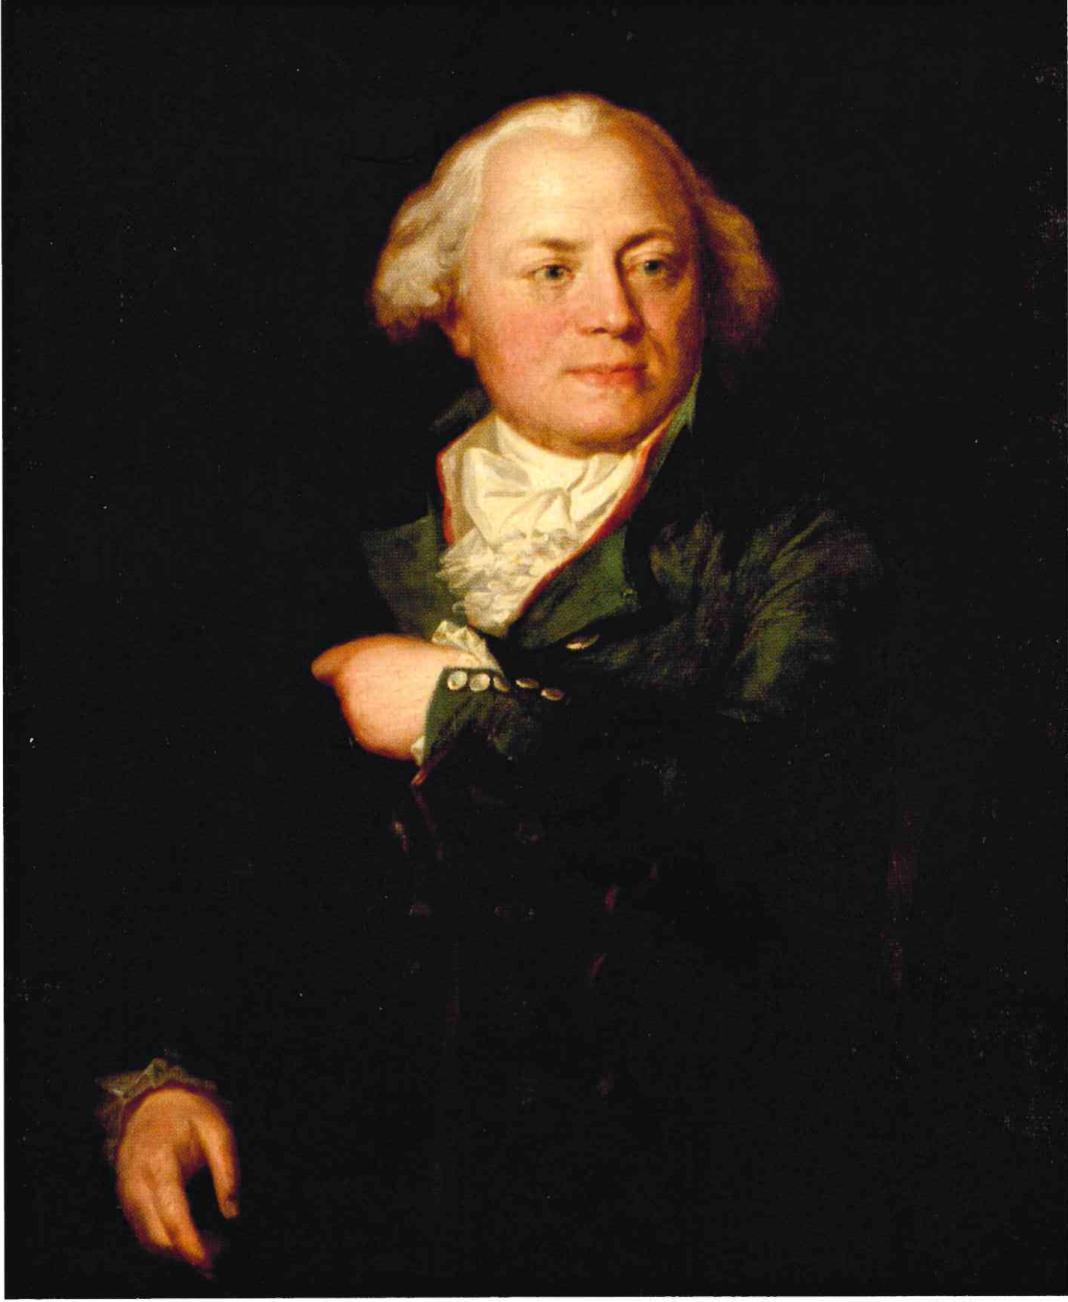 Portrait of Franz Bauer (1758-1840) from 1795, anonymous portrait. – © Hans Walter Lack - The Bauers